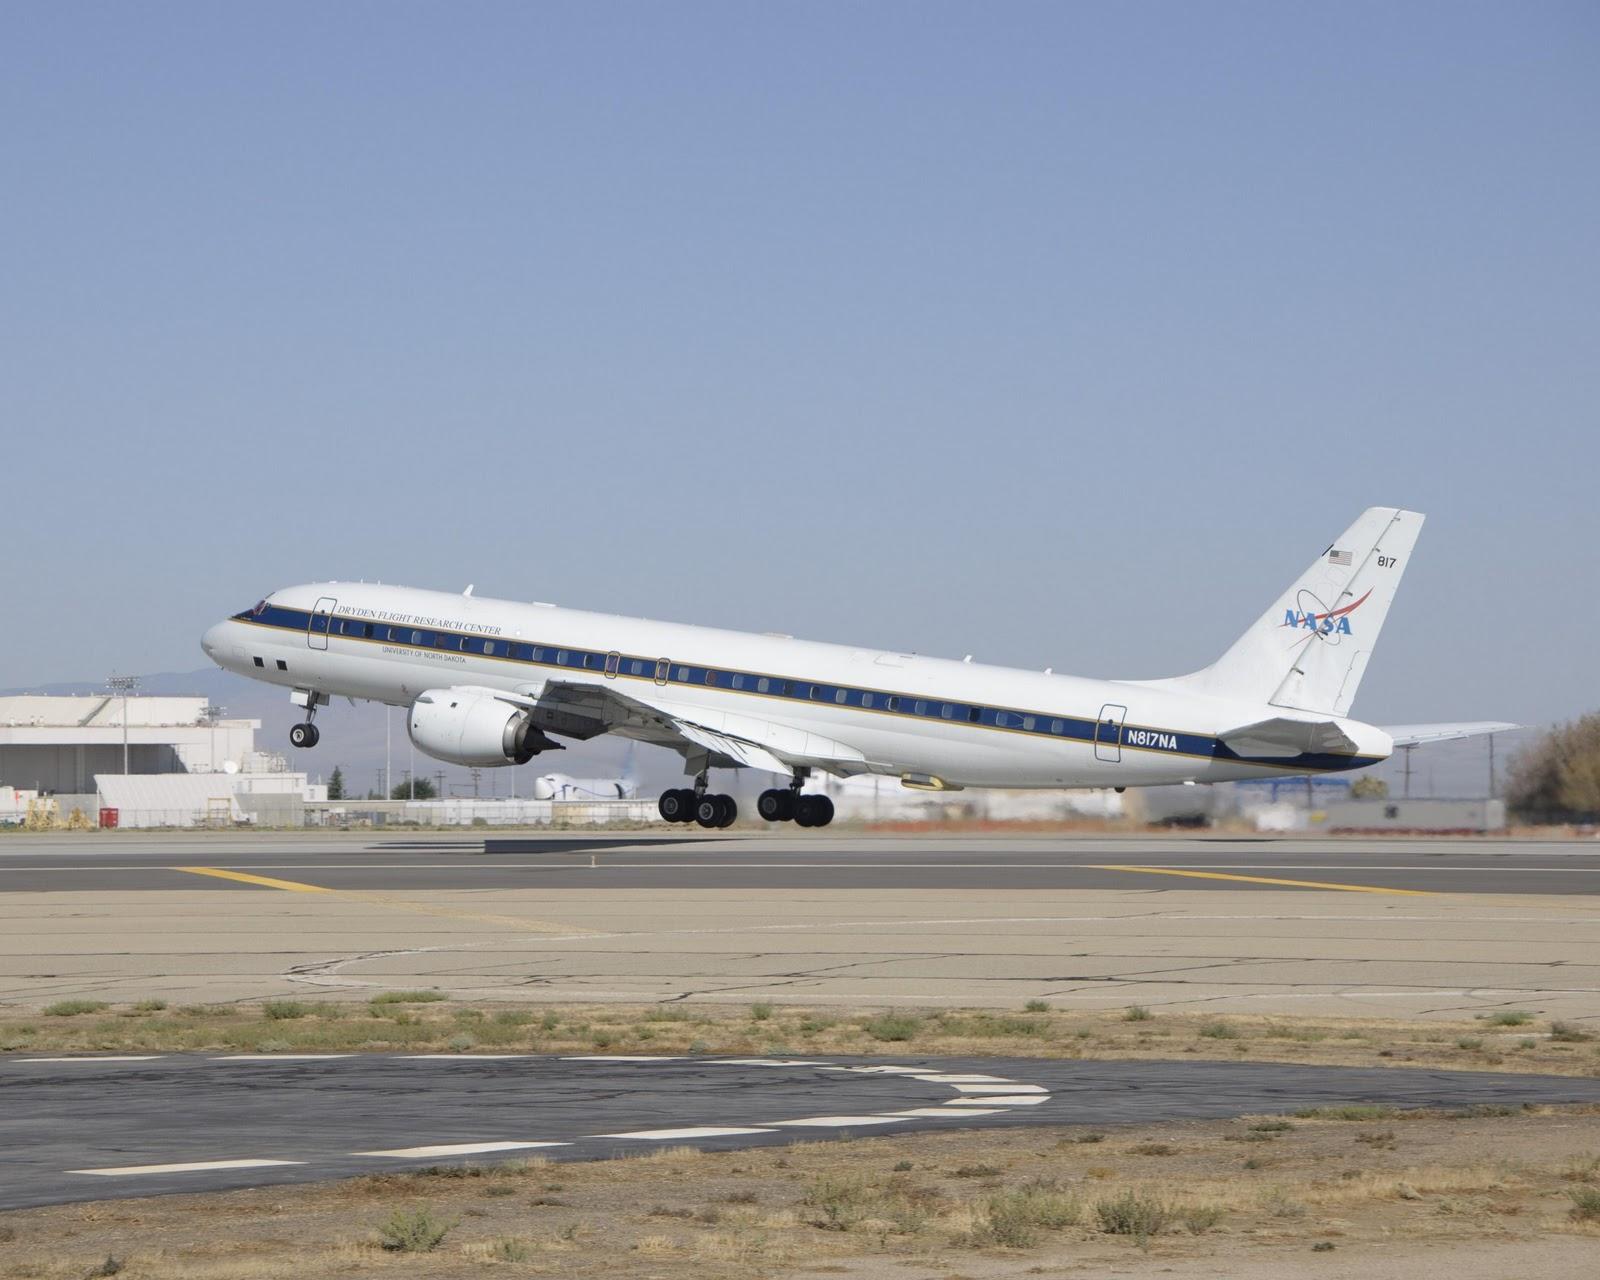 http://4.bp.blogspot.com/-tUbHPY3DELA/TrMJvBa_ucI/AAAAAAAACp4/nzcQ6_ANI2M/s1600/NASA%2527s+DC-8+handled+the+low-attitude+missions.jpg